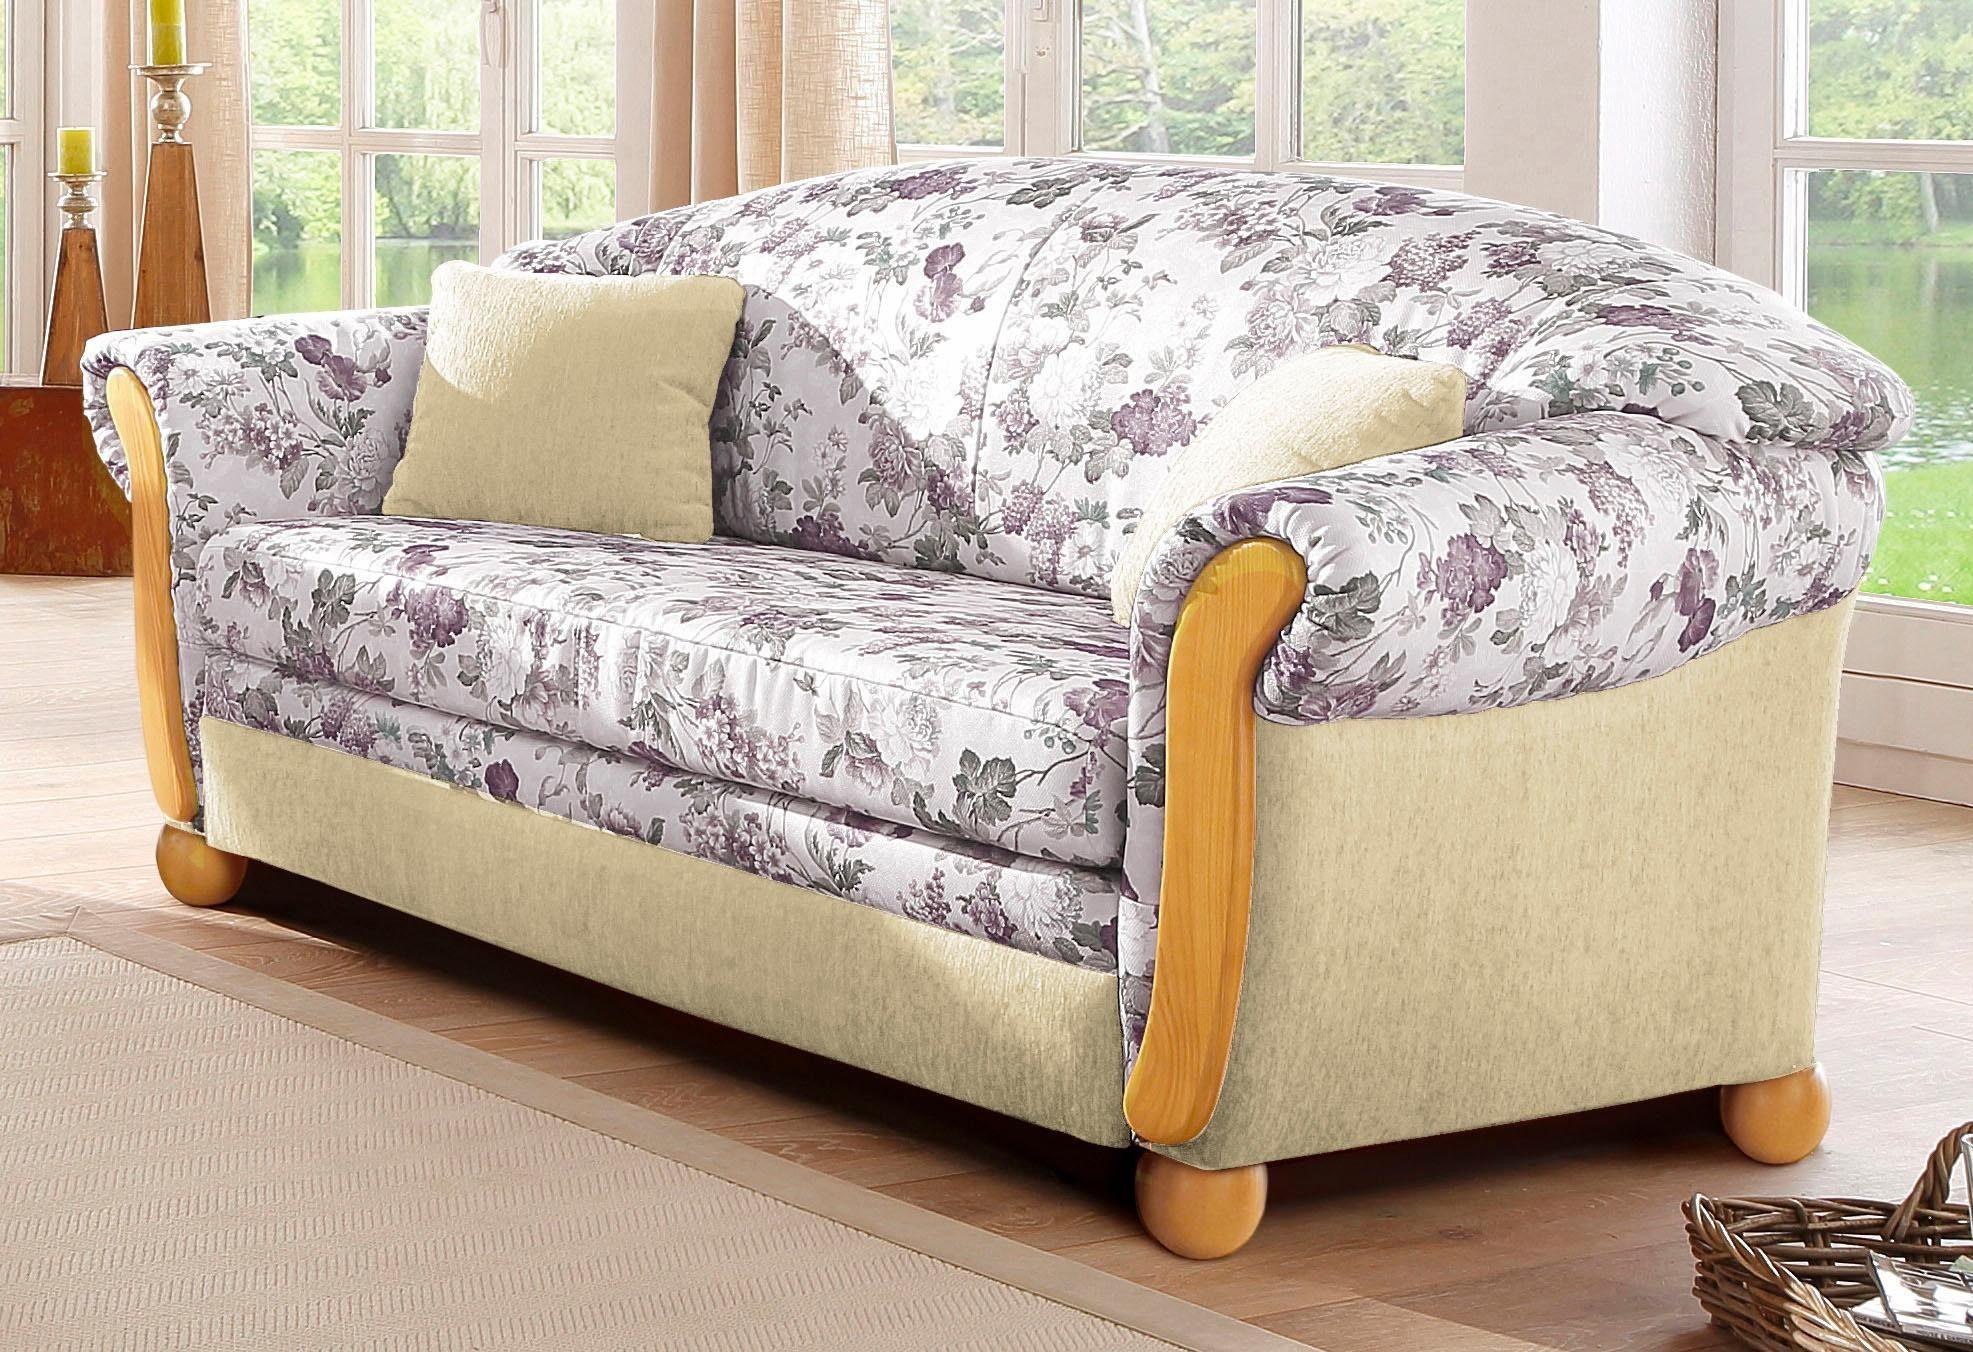 50 sparen home affaire sofa milano nur 699 99 cherry m bel otto. Black Bedroom Furniture Sets. Home Design Ideas